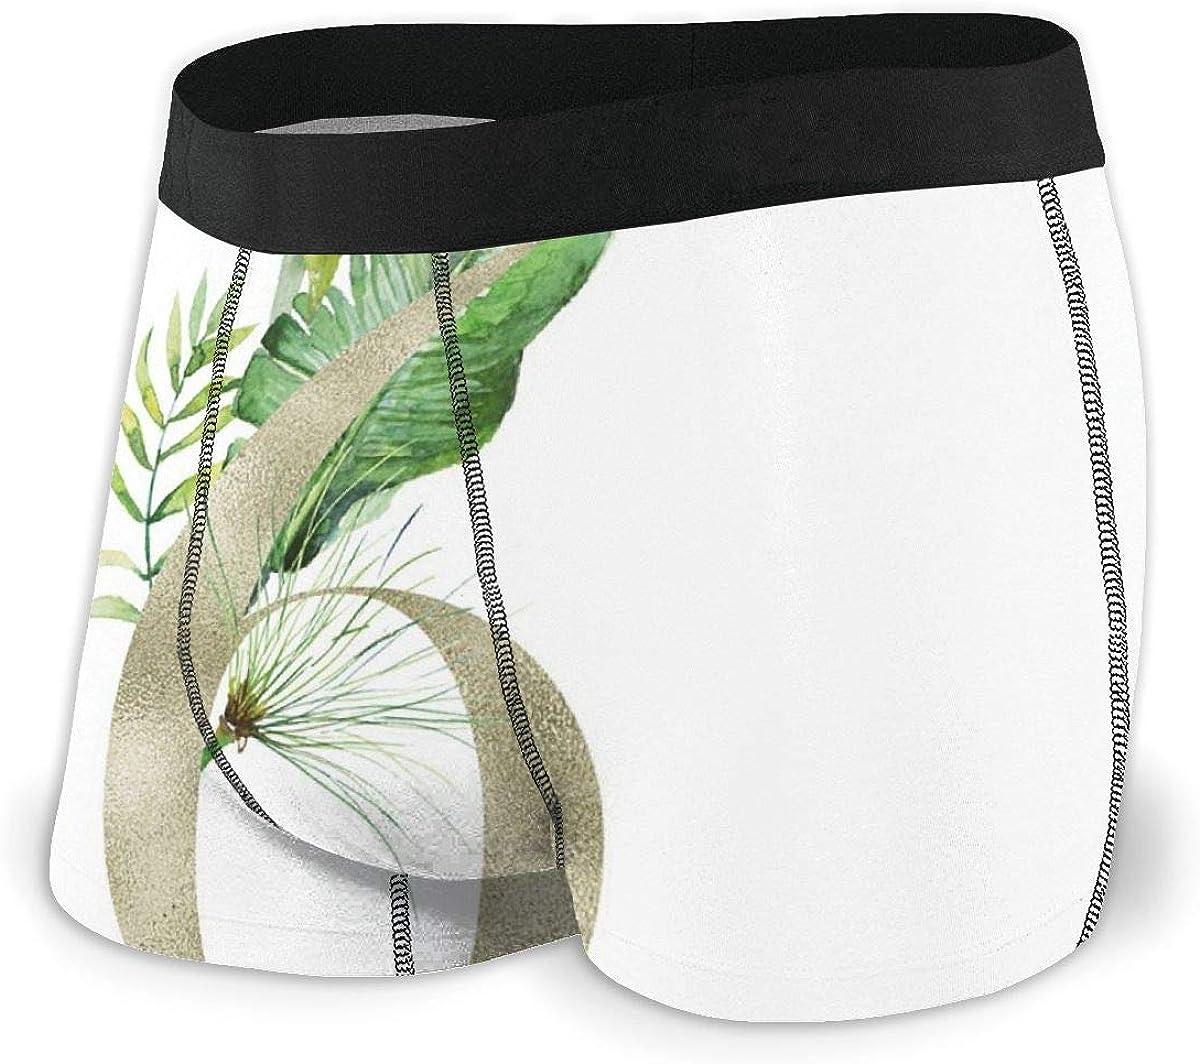 Mens Underwear Floral Tropical Numbers 6 Boys Boxer Briefs Trunks Low Rise Underpants Man